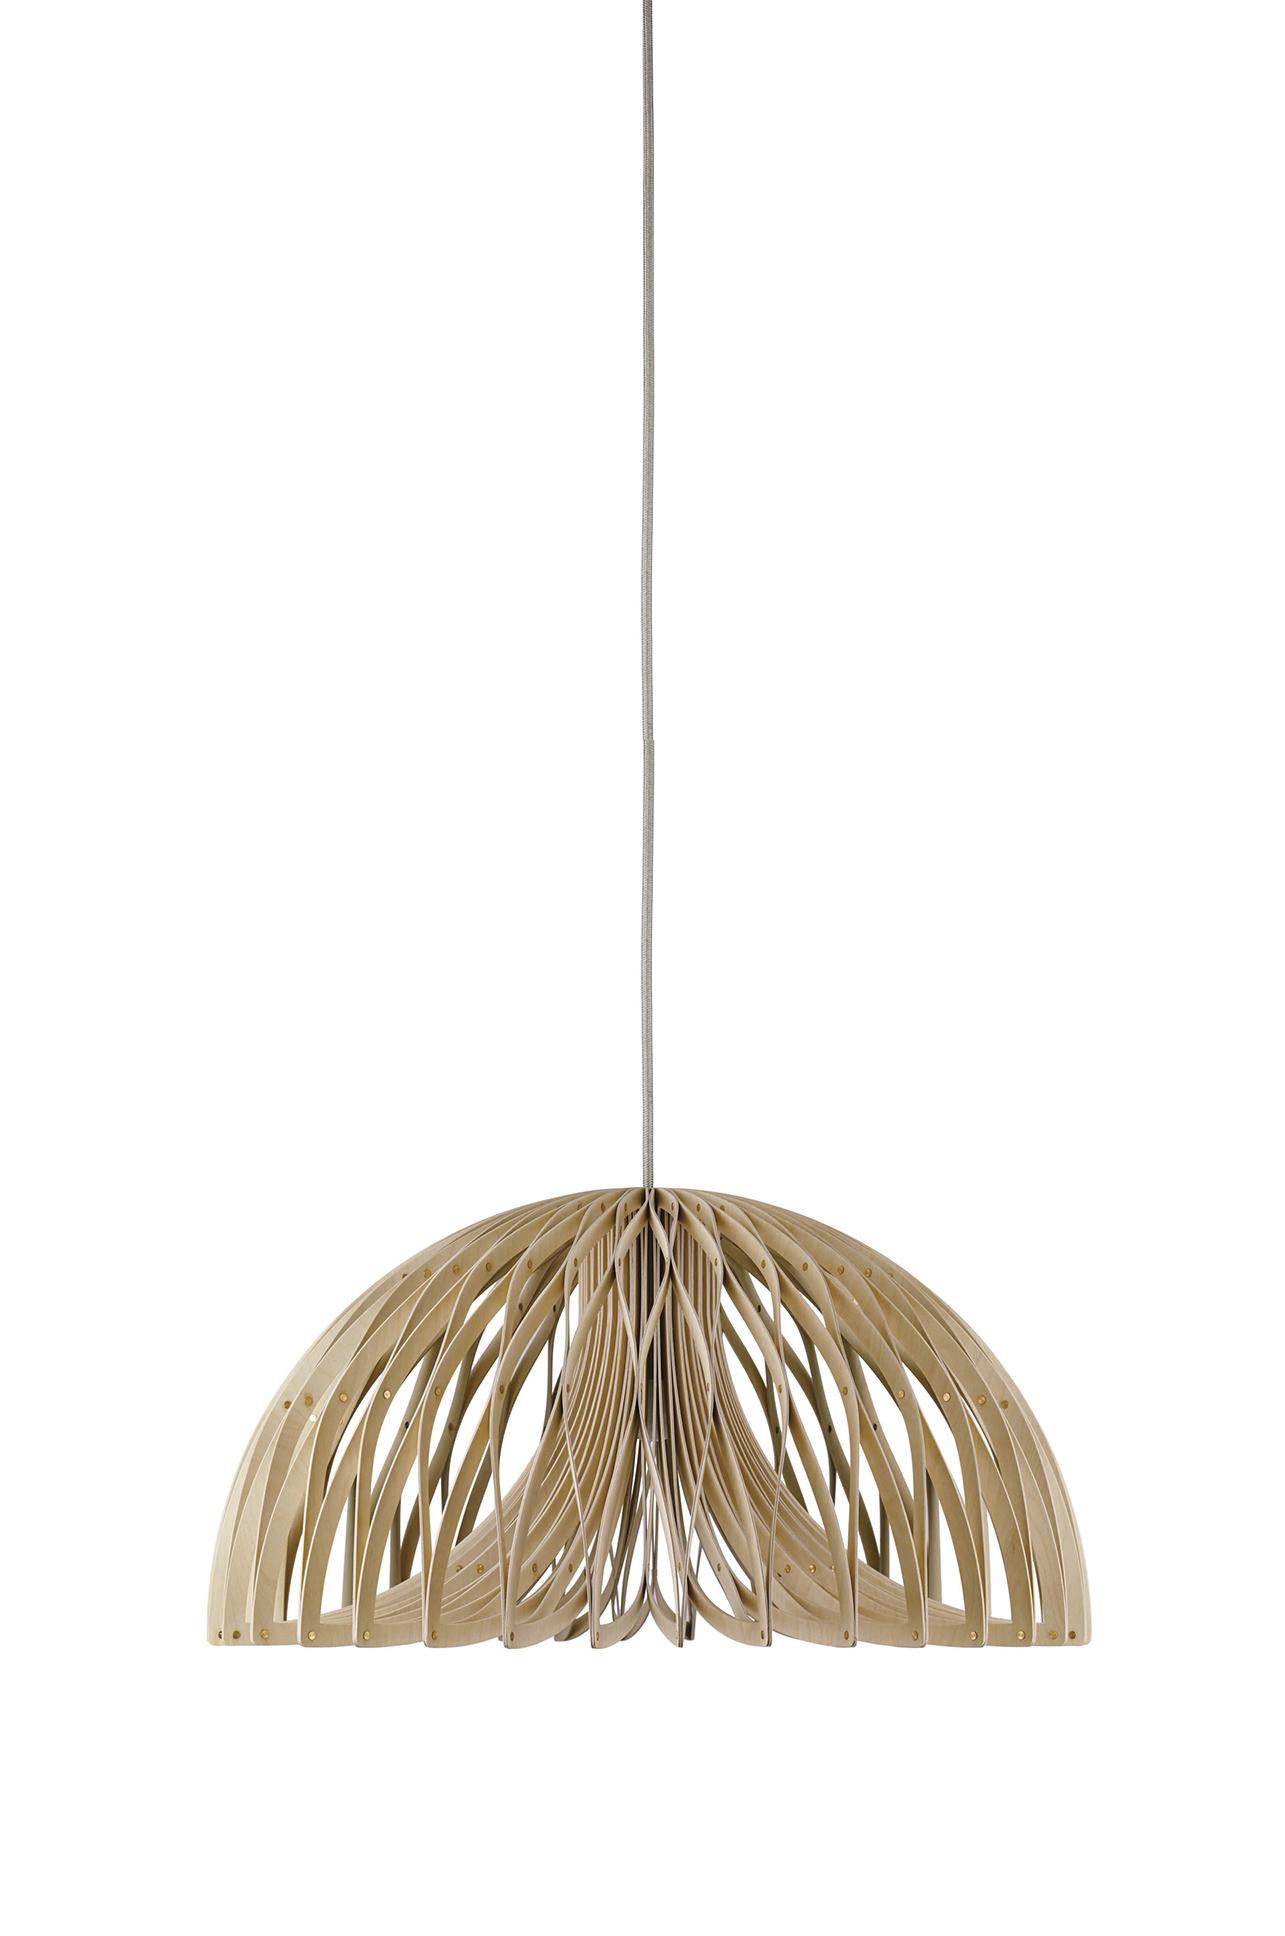 Image of   Strech Pendant - Ø60 cm